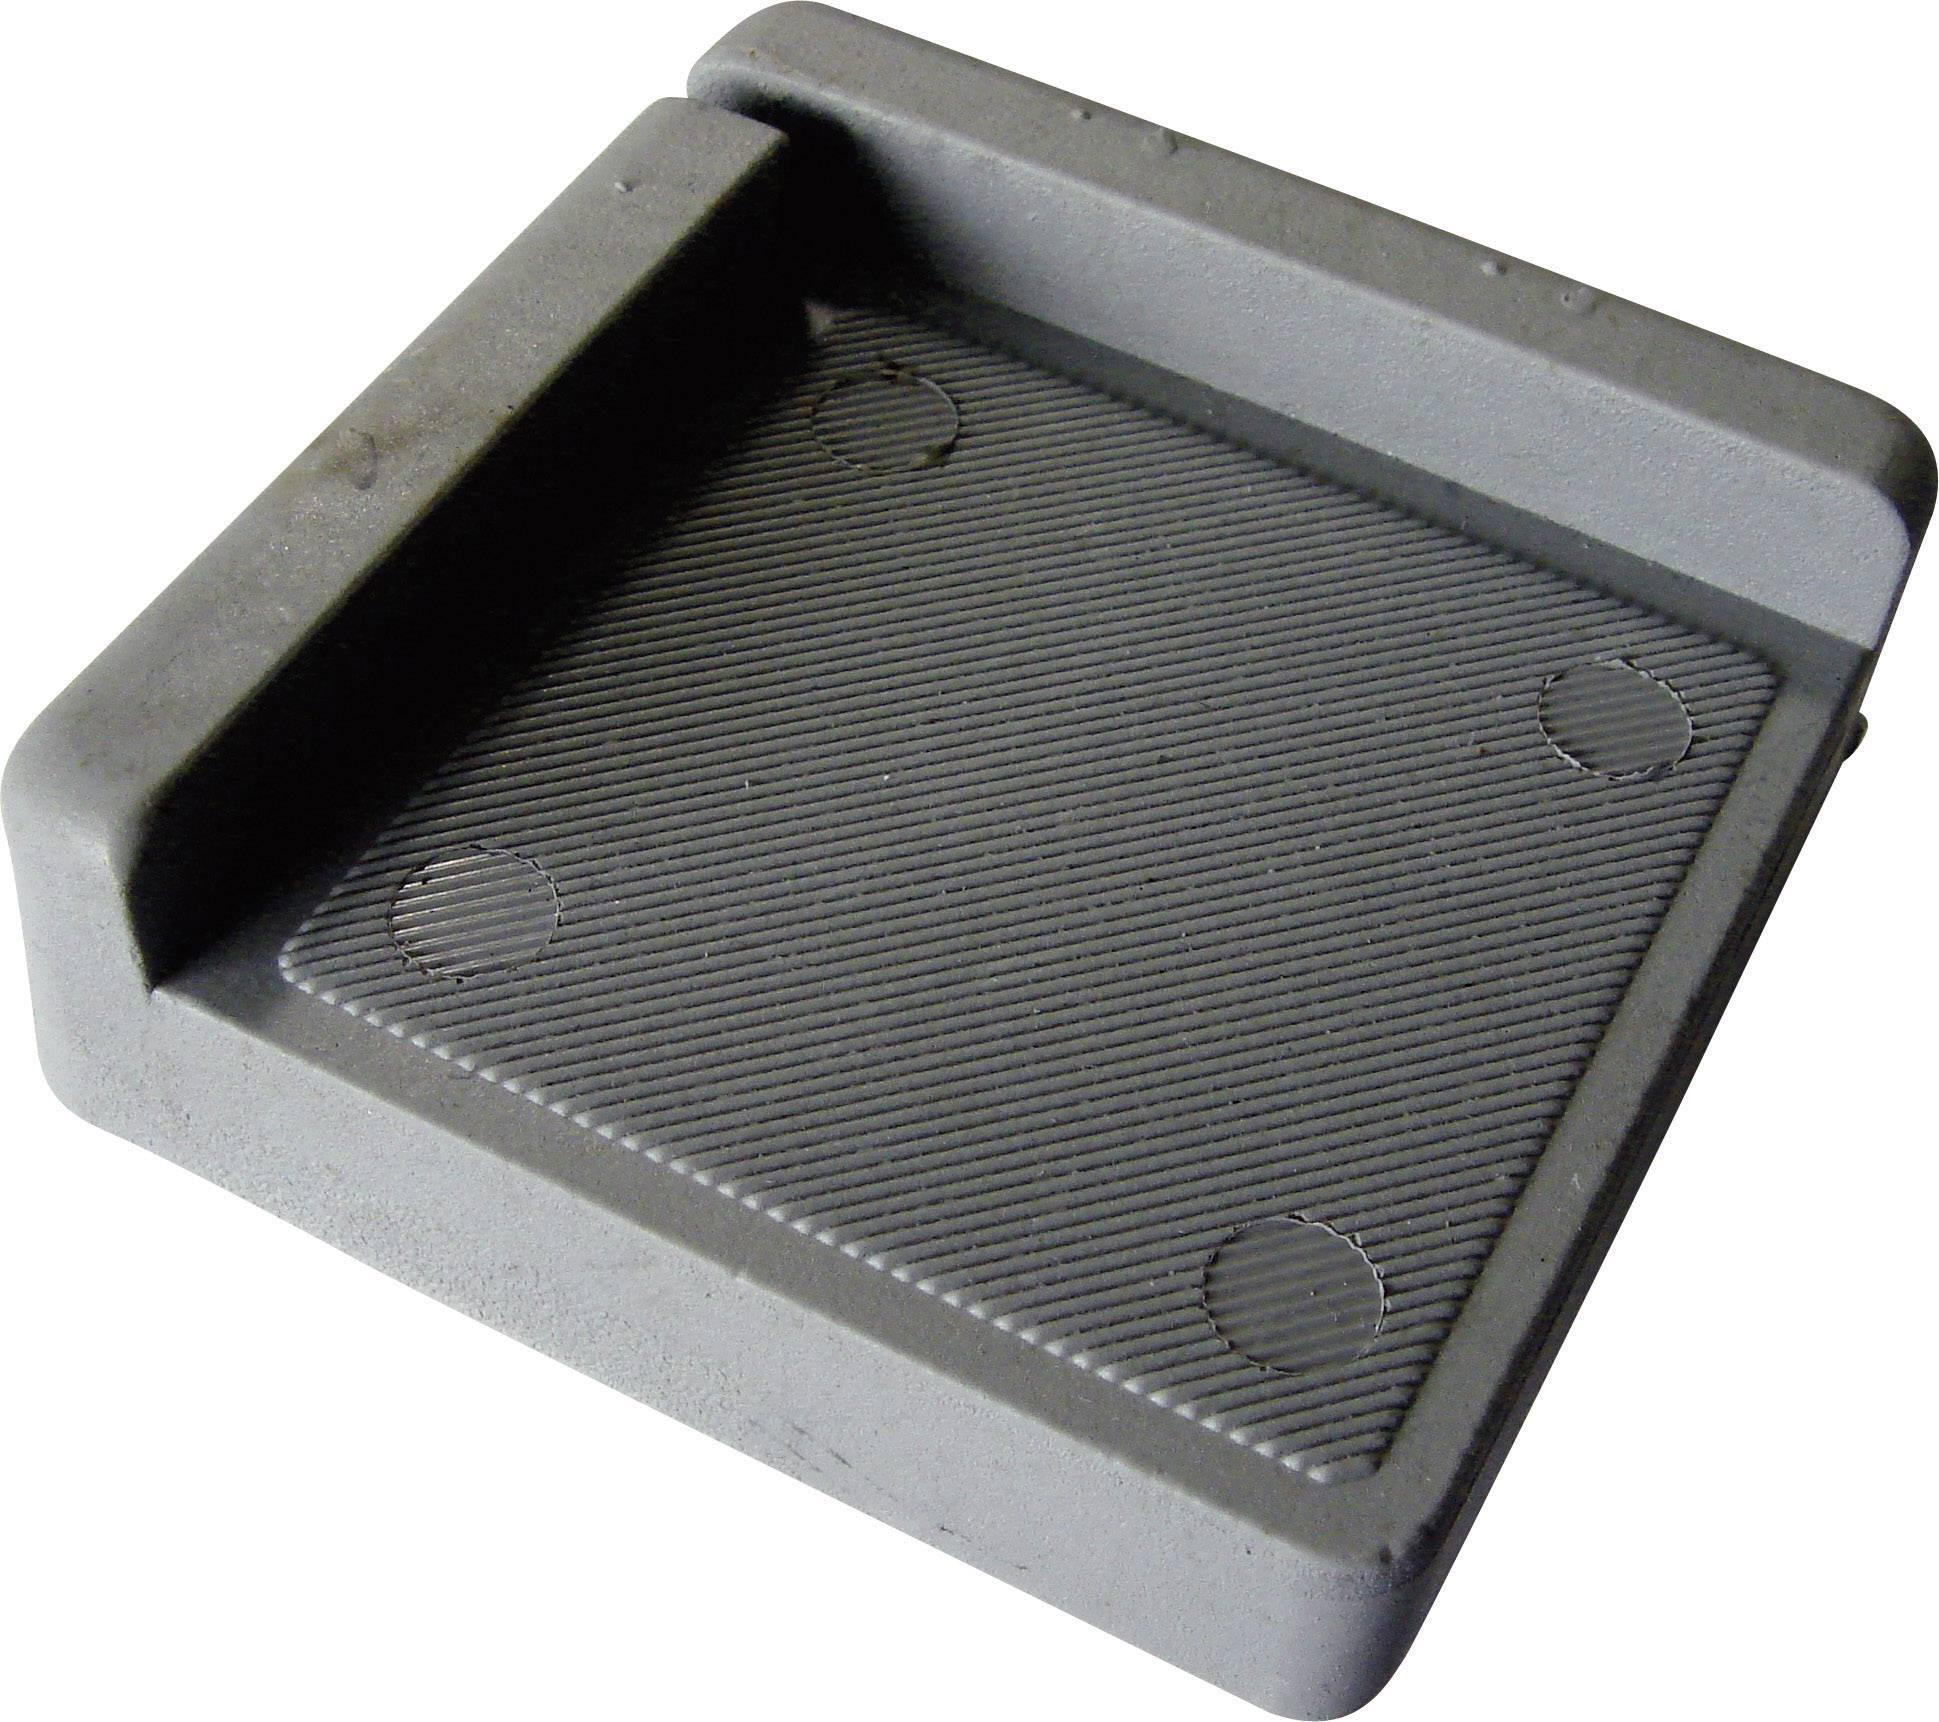 Tlmiaci rohová podložka PB Fastener 121845, (d x š x v) 75 x 75 x 25 mm, sivá, 1 ks